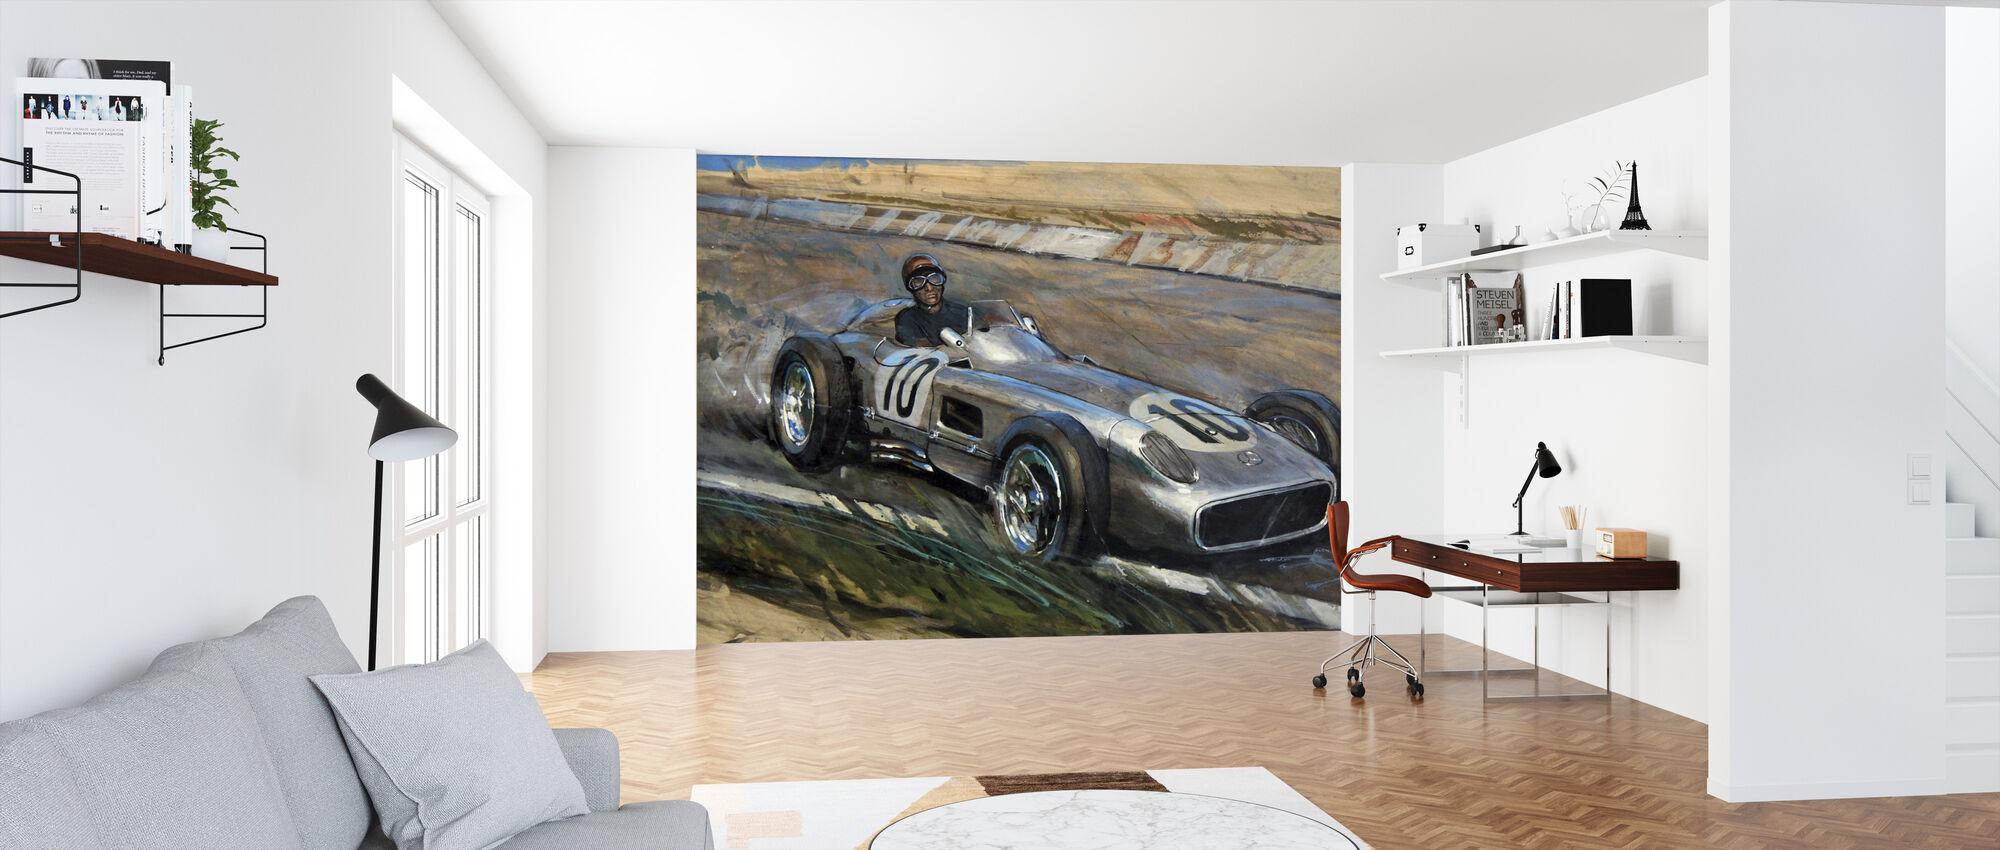 At Speed - Wallpaper - Office